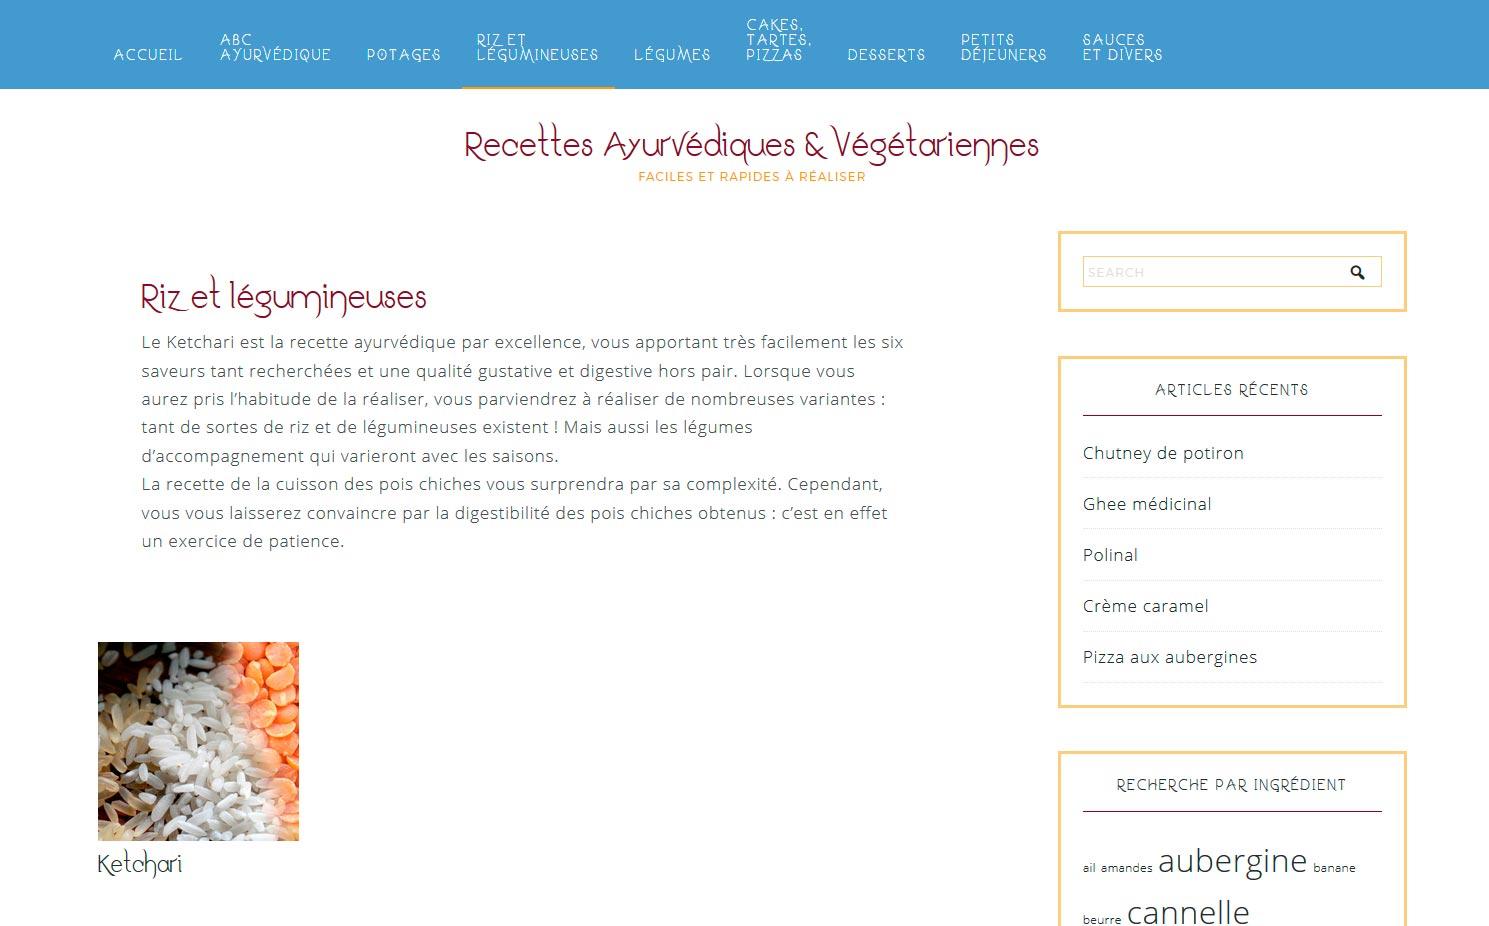 riz-legumineuses-ayurveda-enezwebpaper